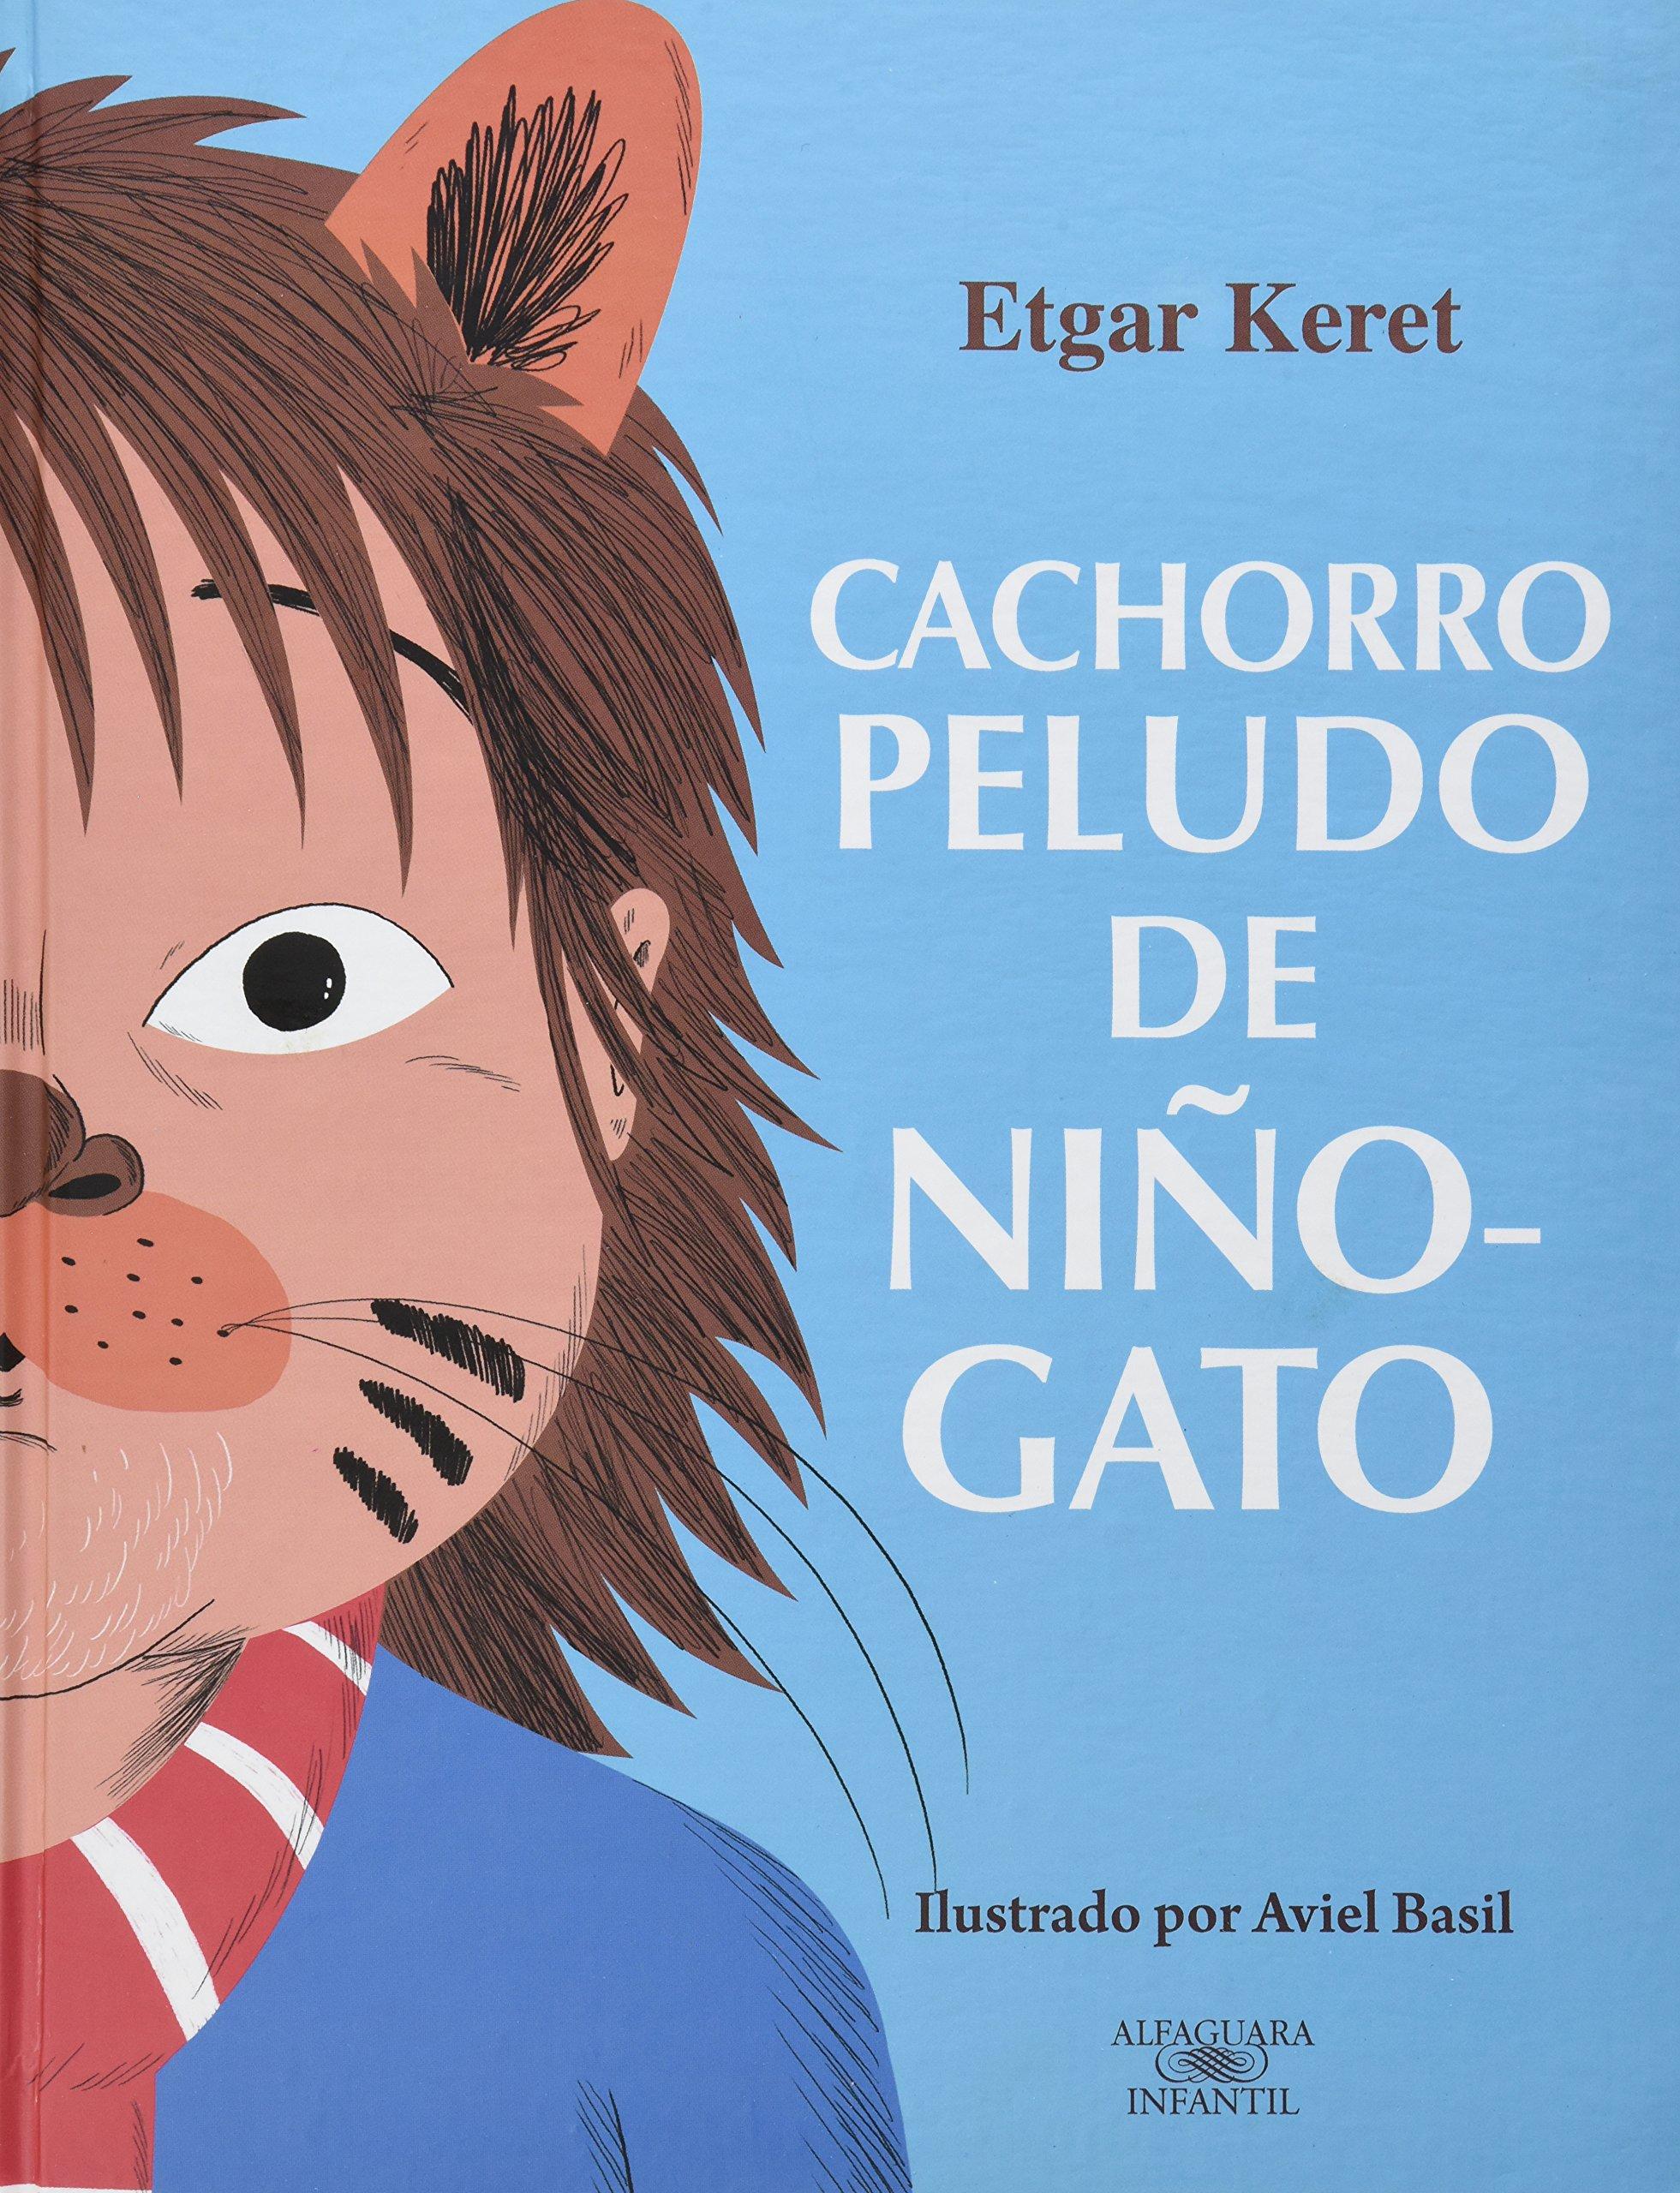 CACHORRO PELUDO DE NIÑO-GATO (Spanish) Hardcover – 2013